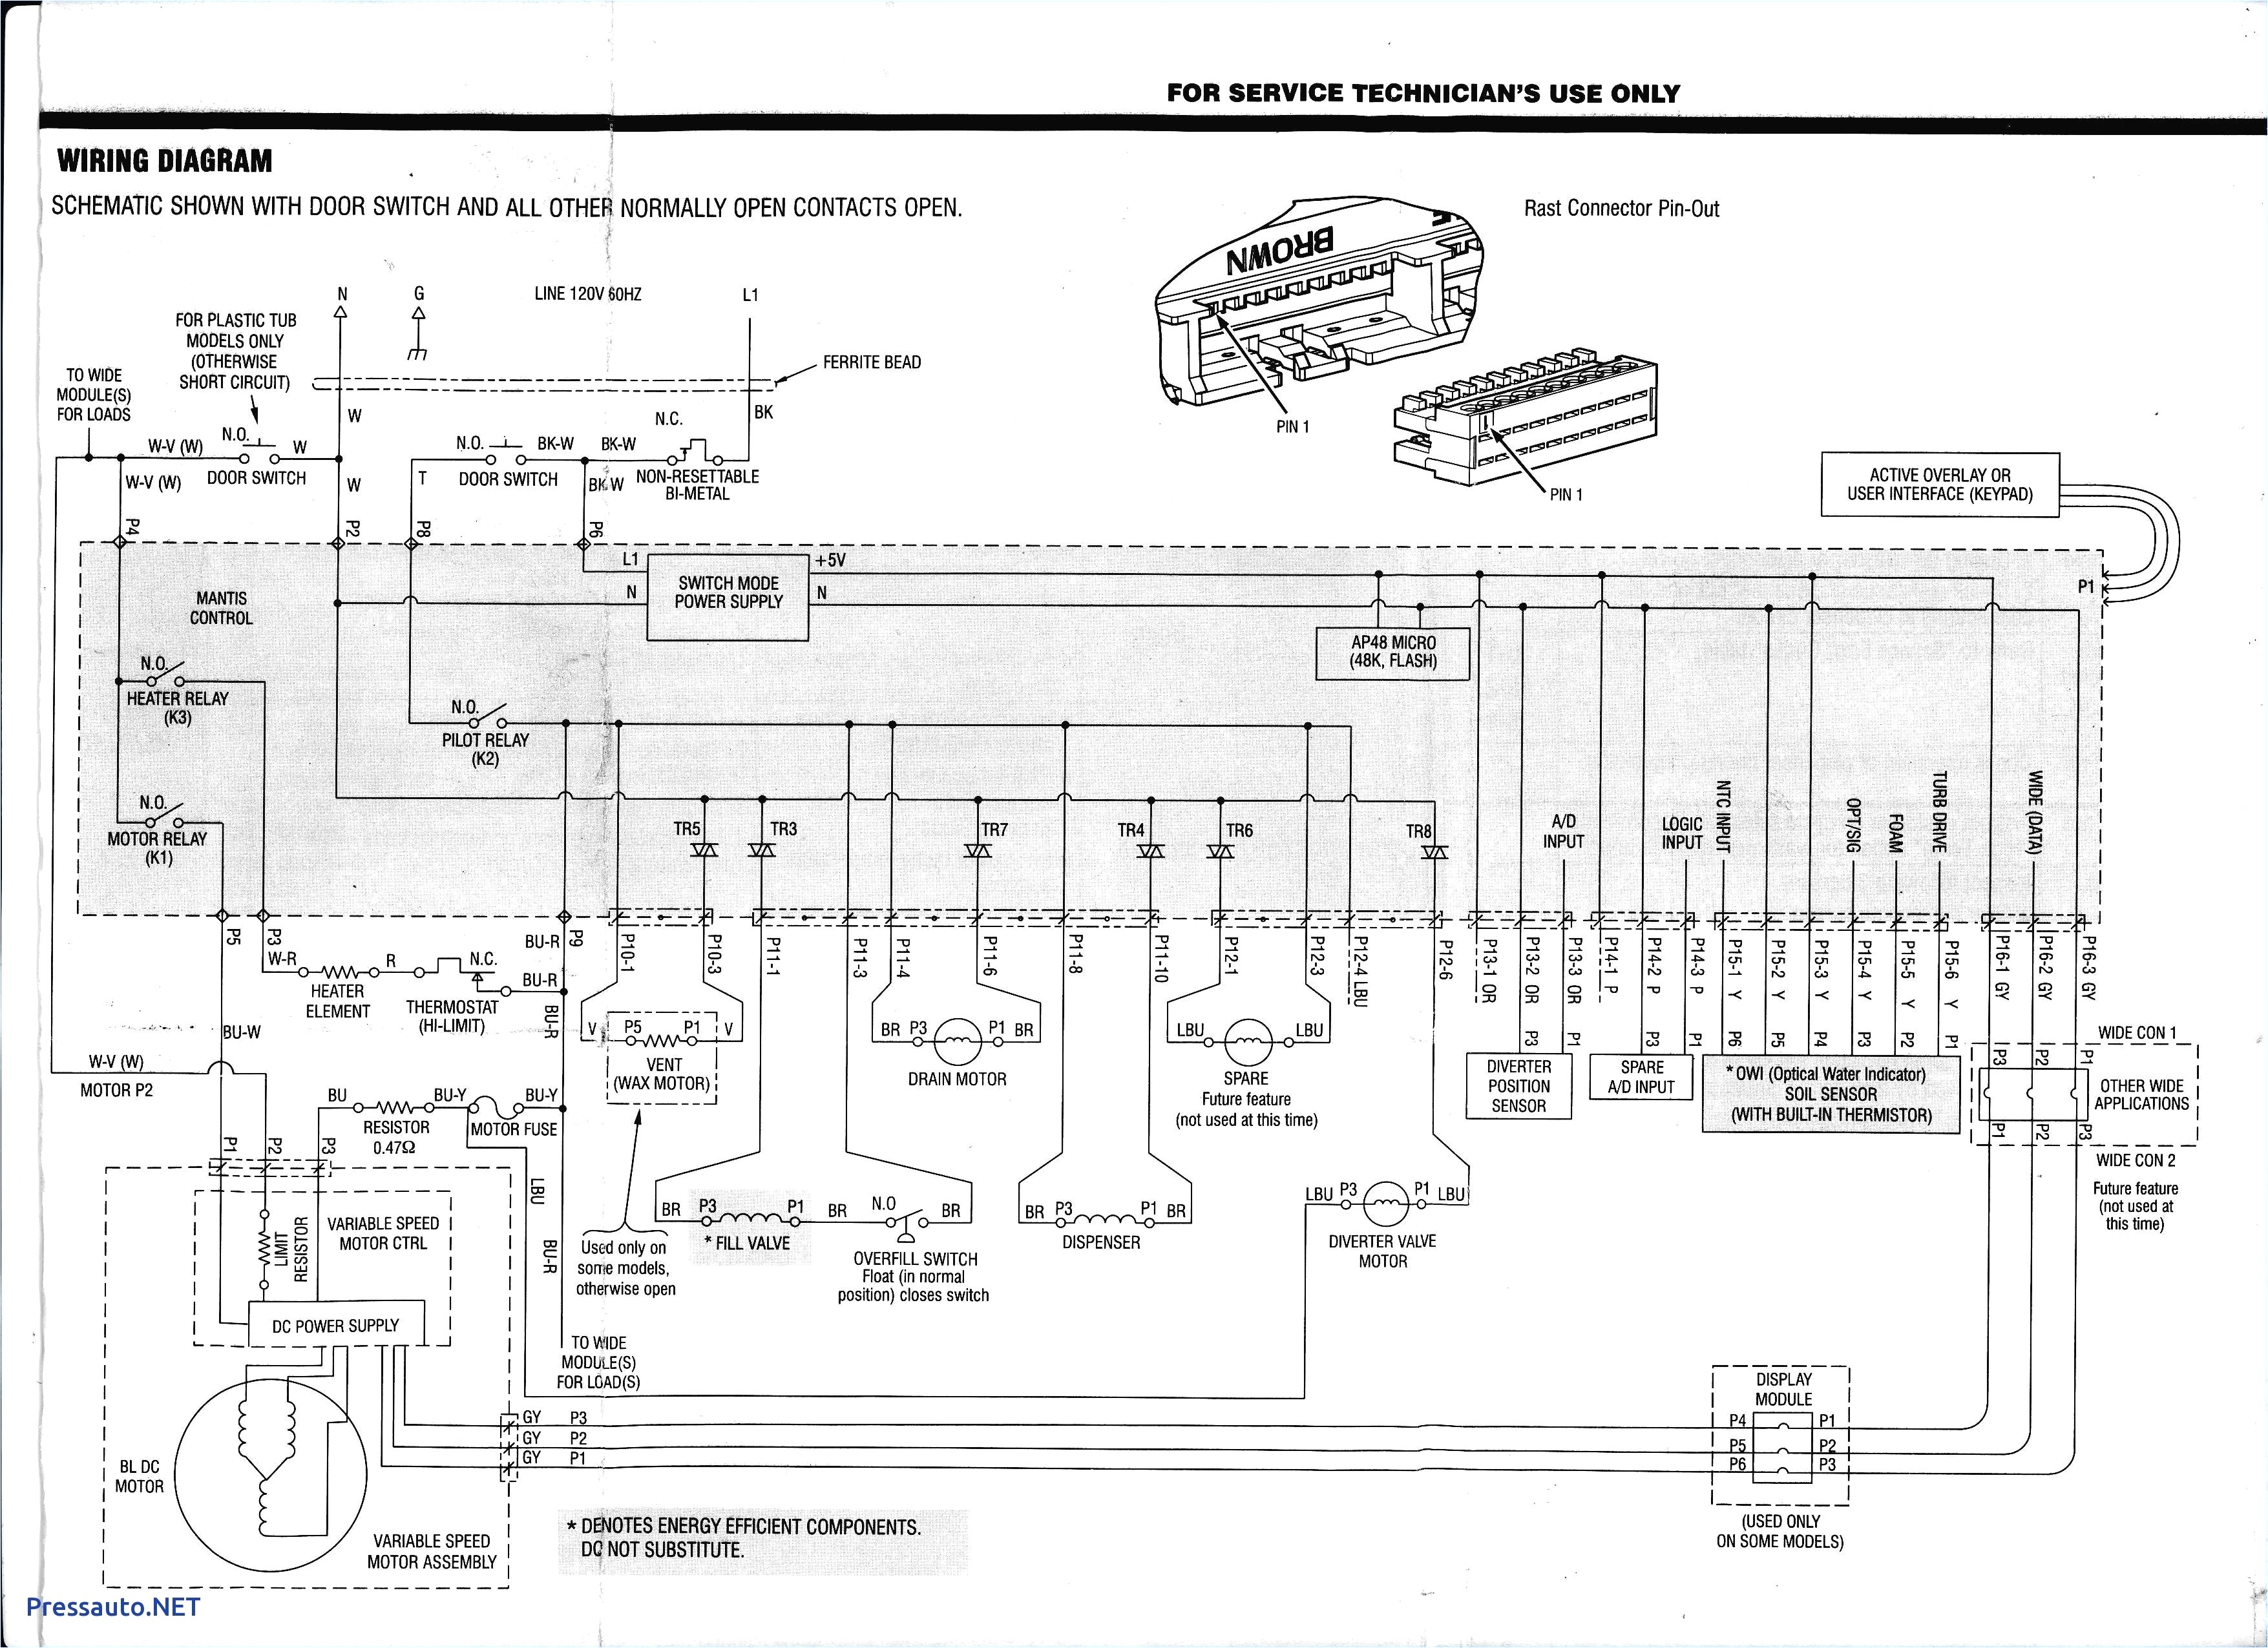 ge dryer schematic diagram wiring diagram files ge dryer schematic diagram wiring diagrams show ge dryer